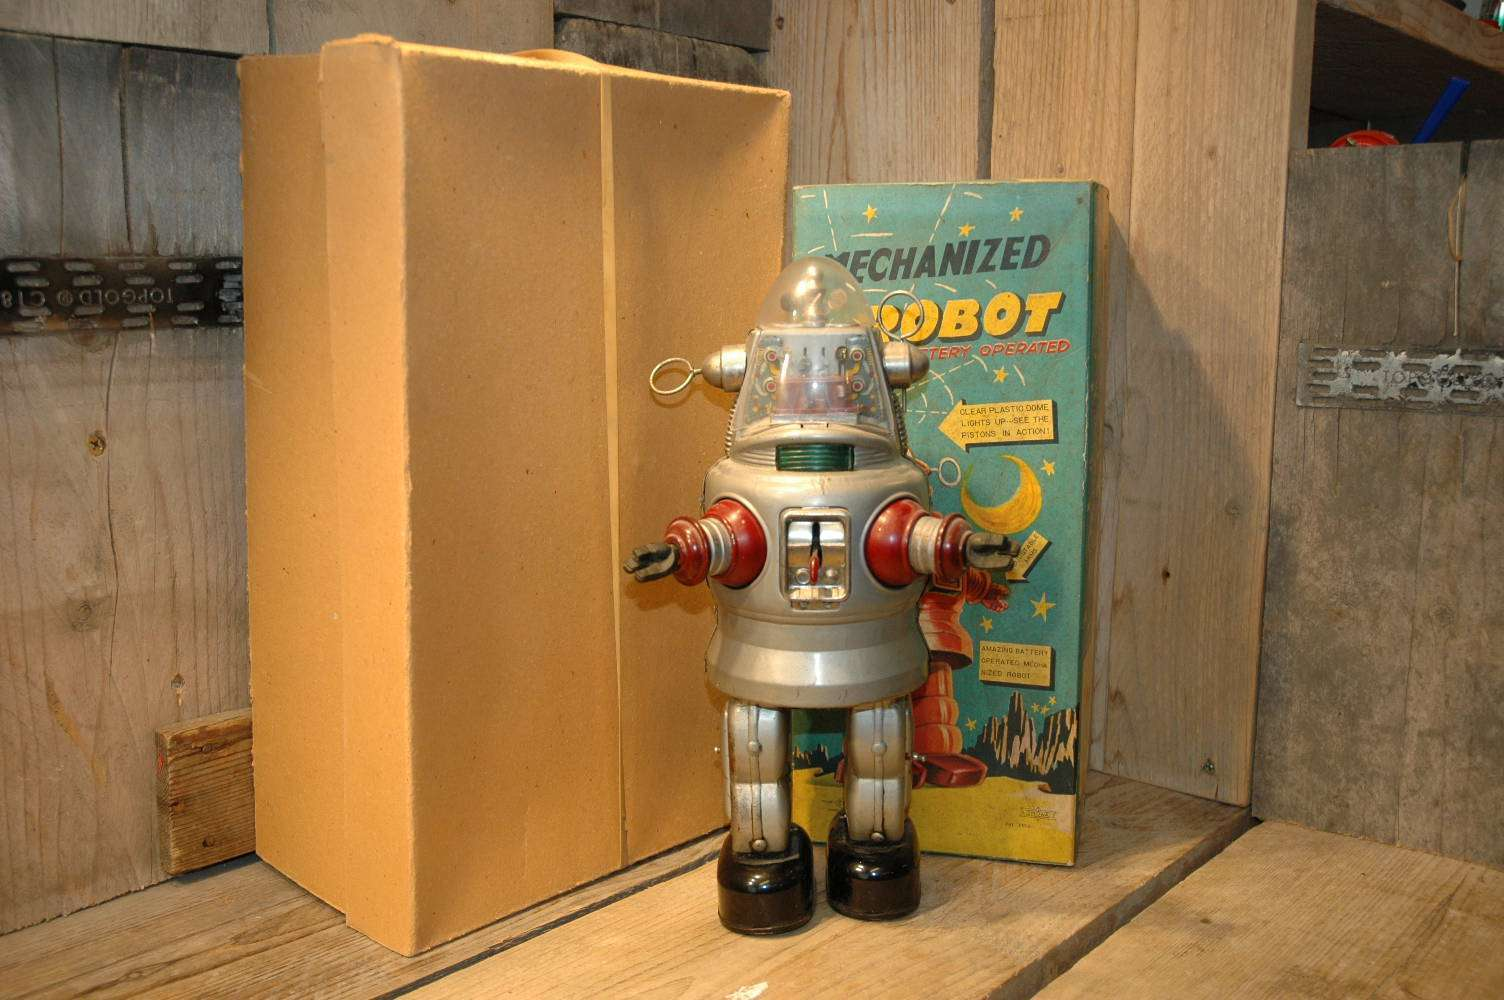 Nomura - Mechanized Robby Robot C-Cell Grey